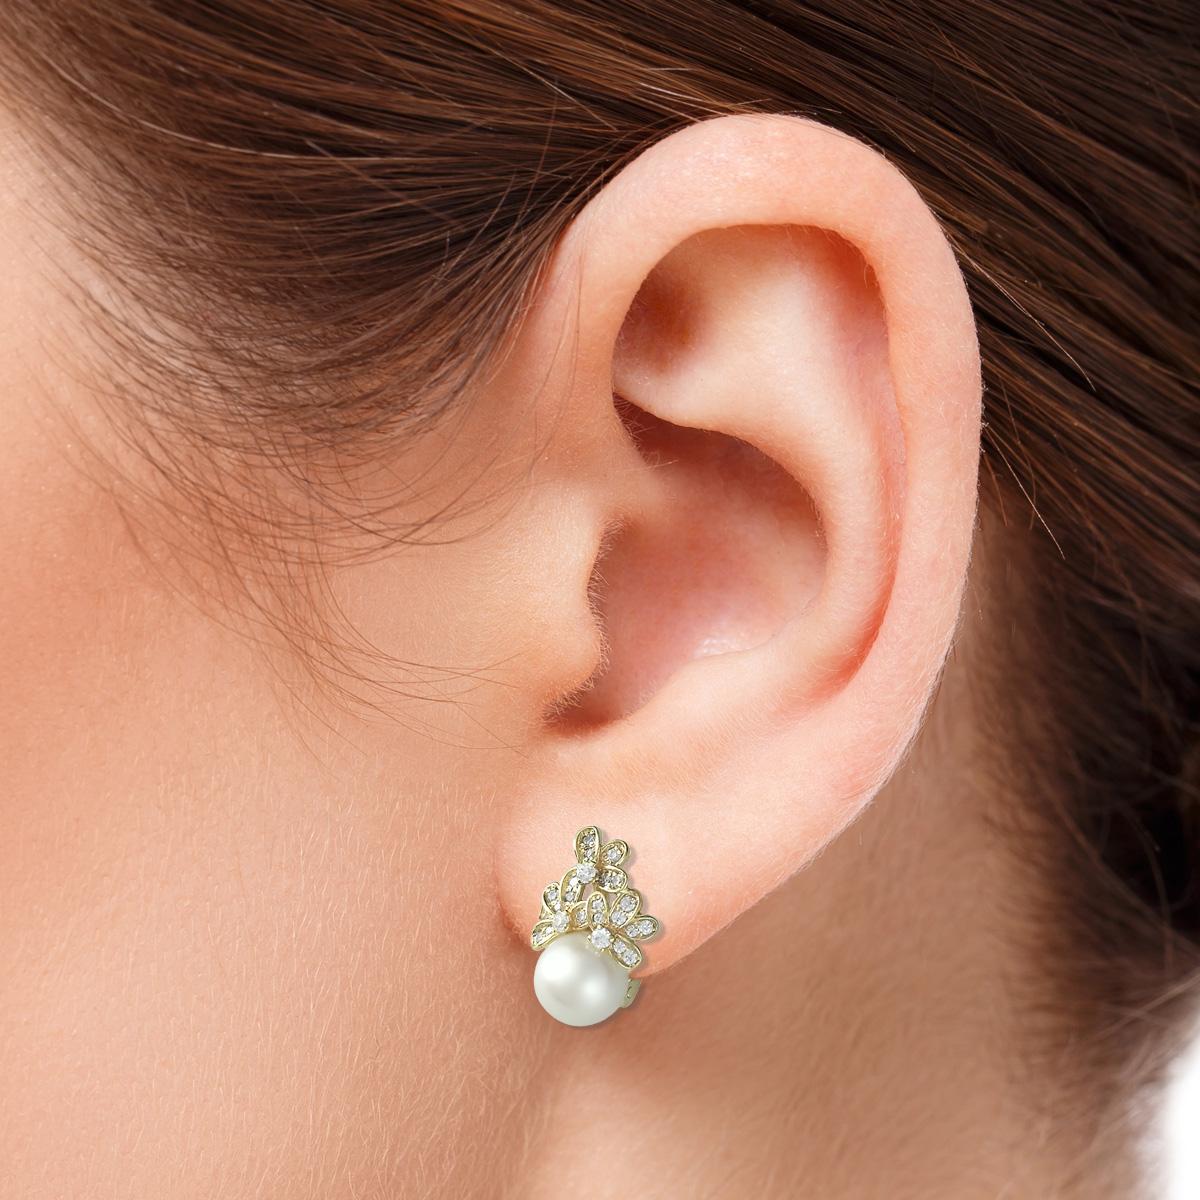 Серьги с морским жемчугом и бриллиантами «Марина»